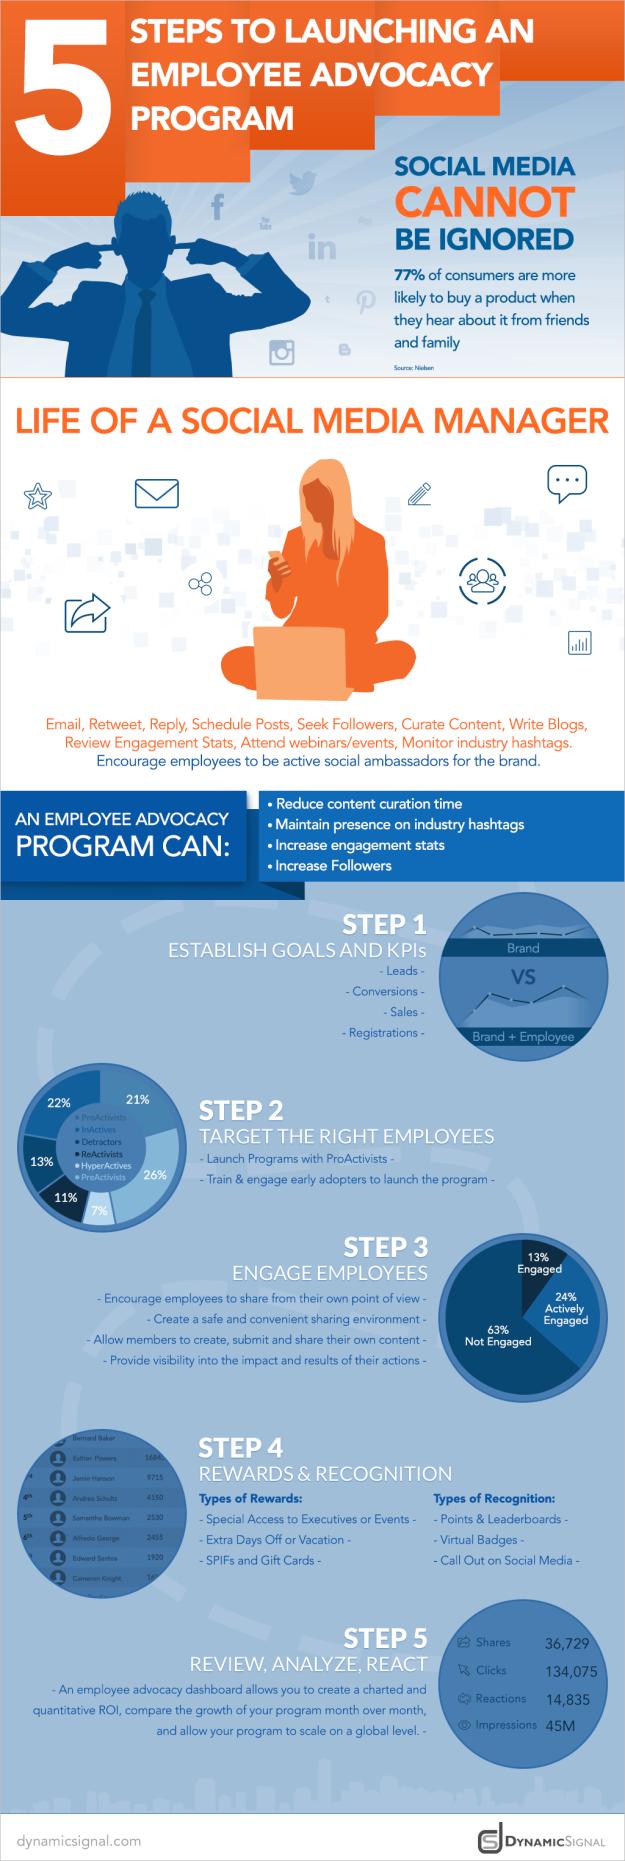 5-steps-to-launching-ea-program